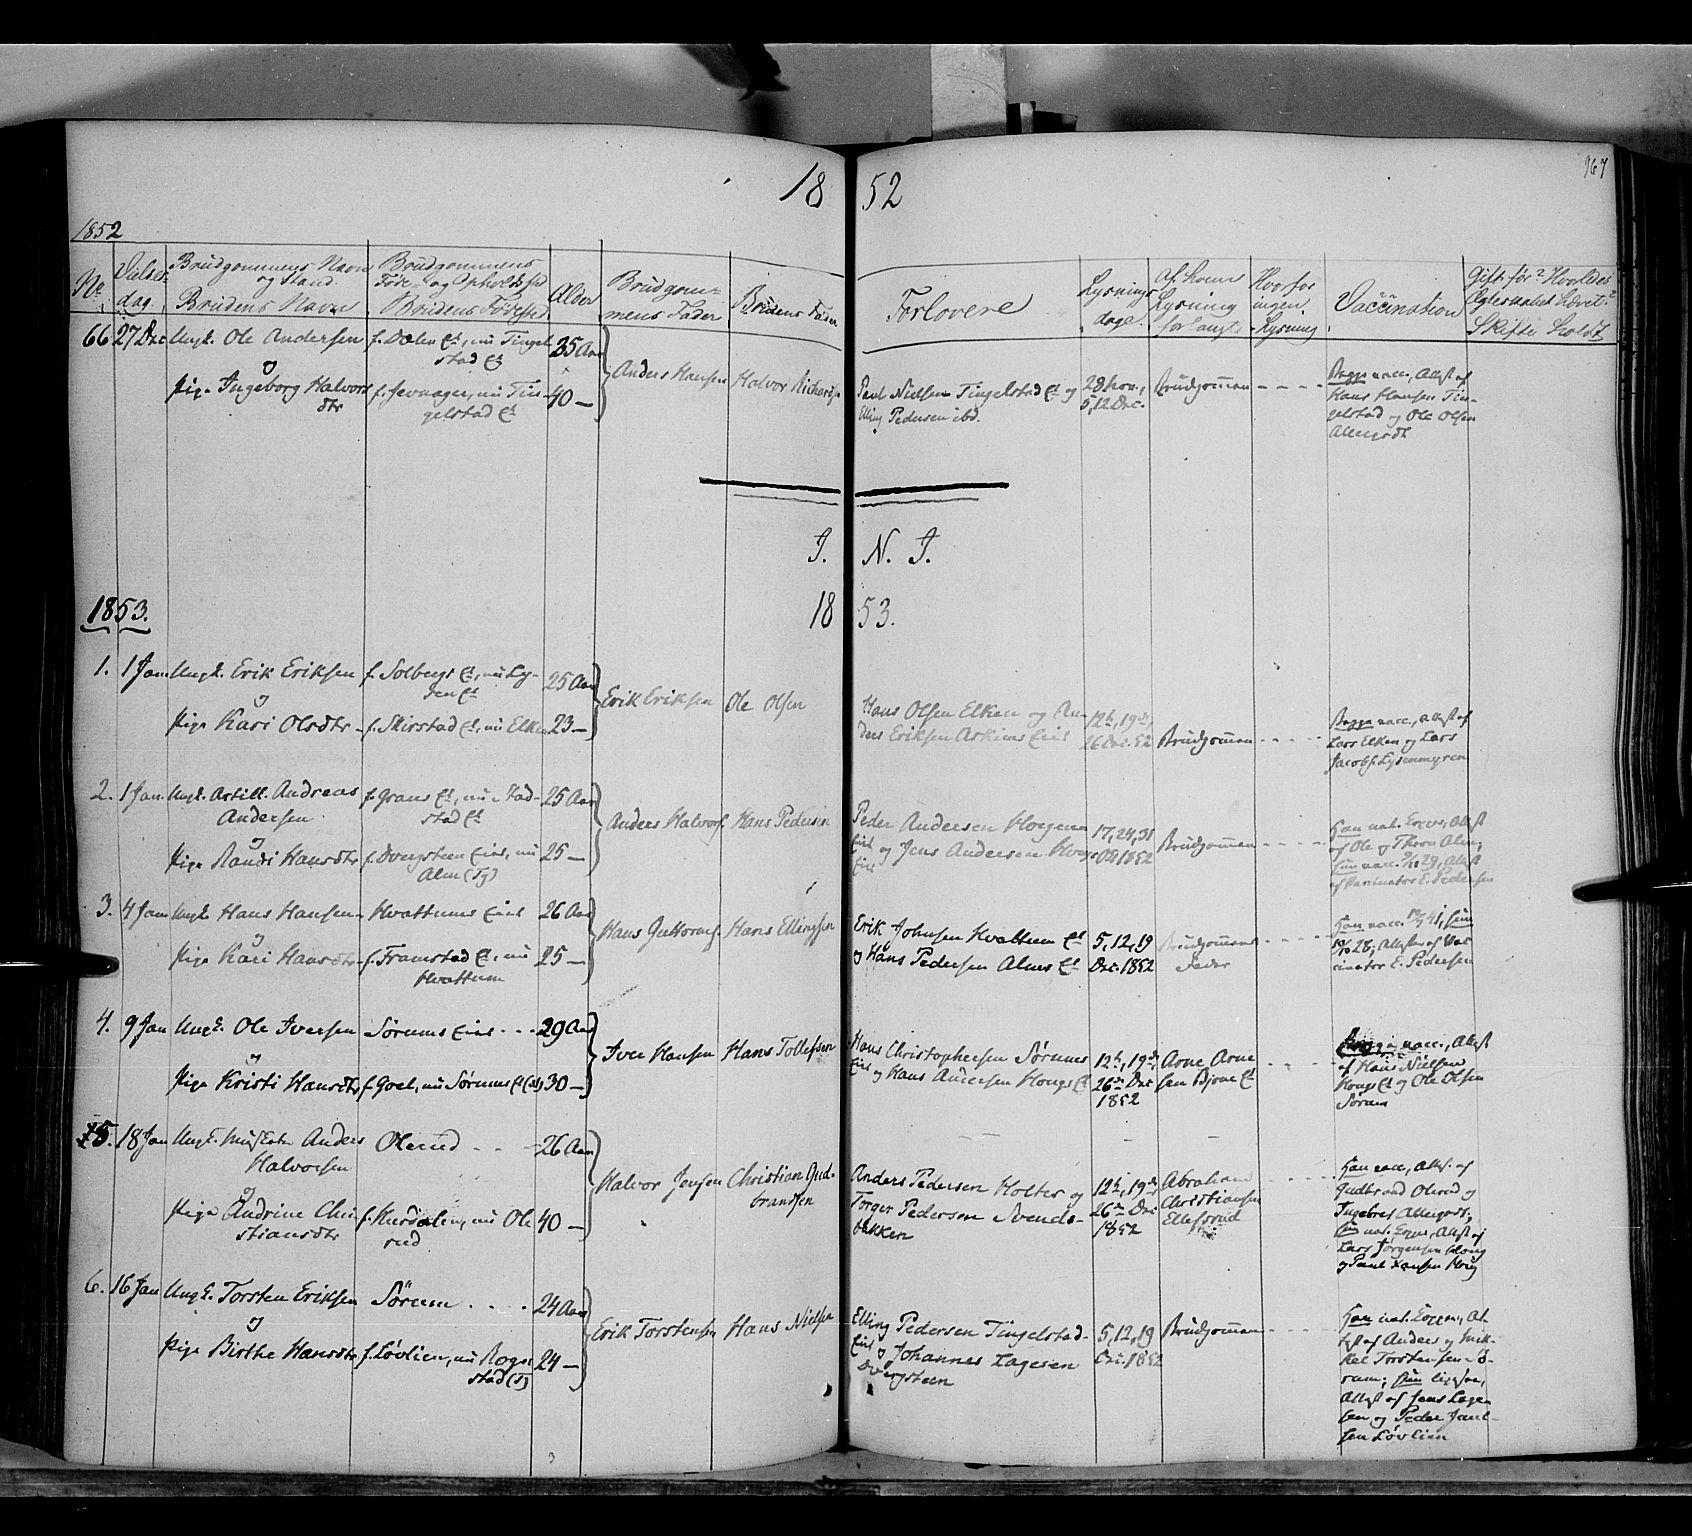 SAH, Gran prestekontor, Ministerialbok nr. 11, 1842-1856, s. 966-967